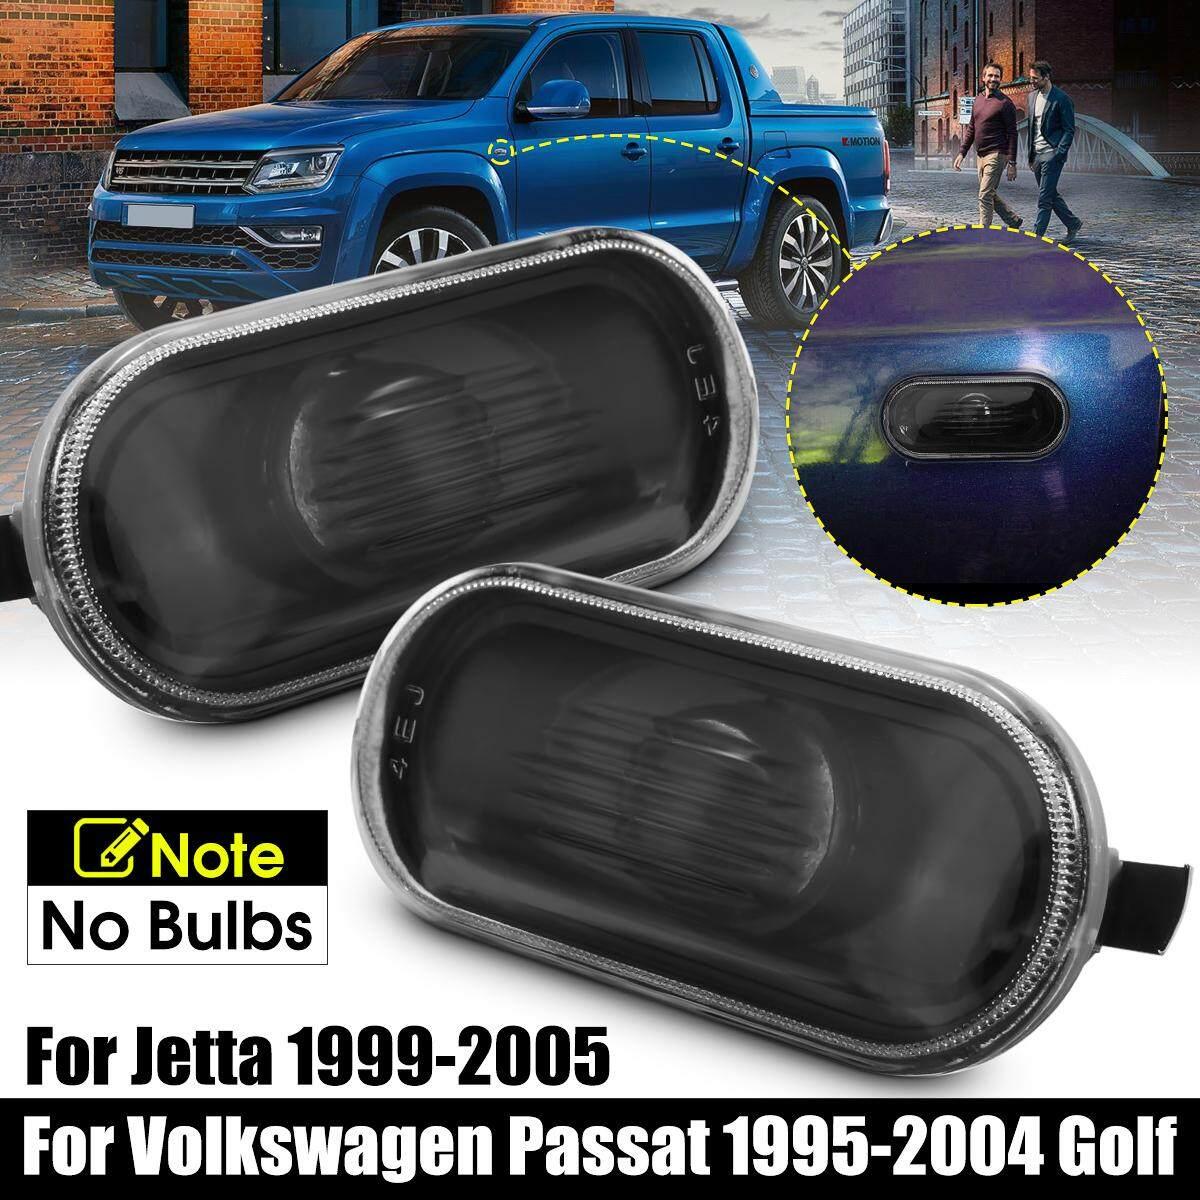 Additionally 2005 Vw Jetta Fuse Box Diagram On Fuse Box Vw Golf 2005